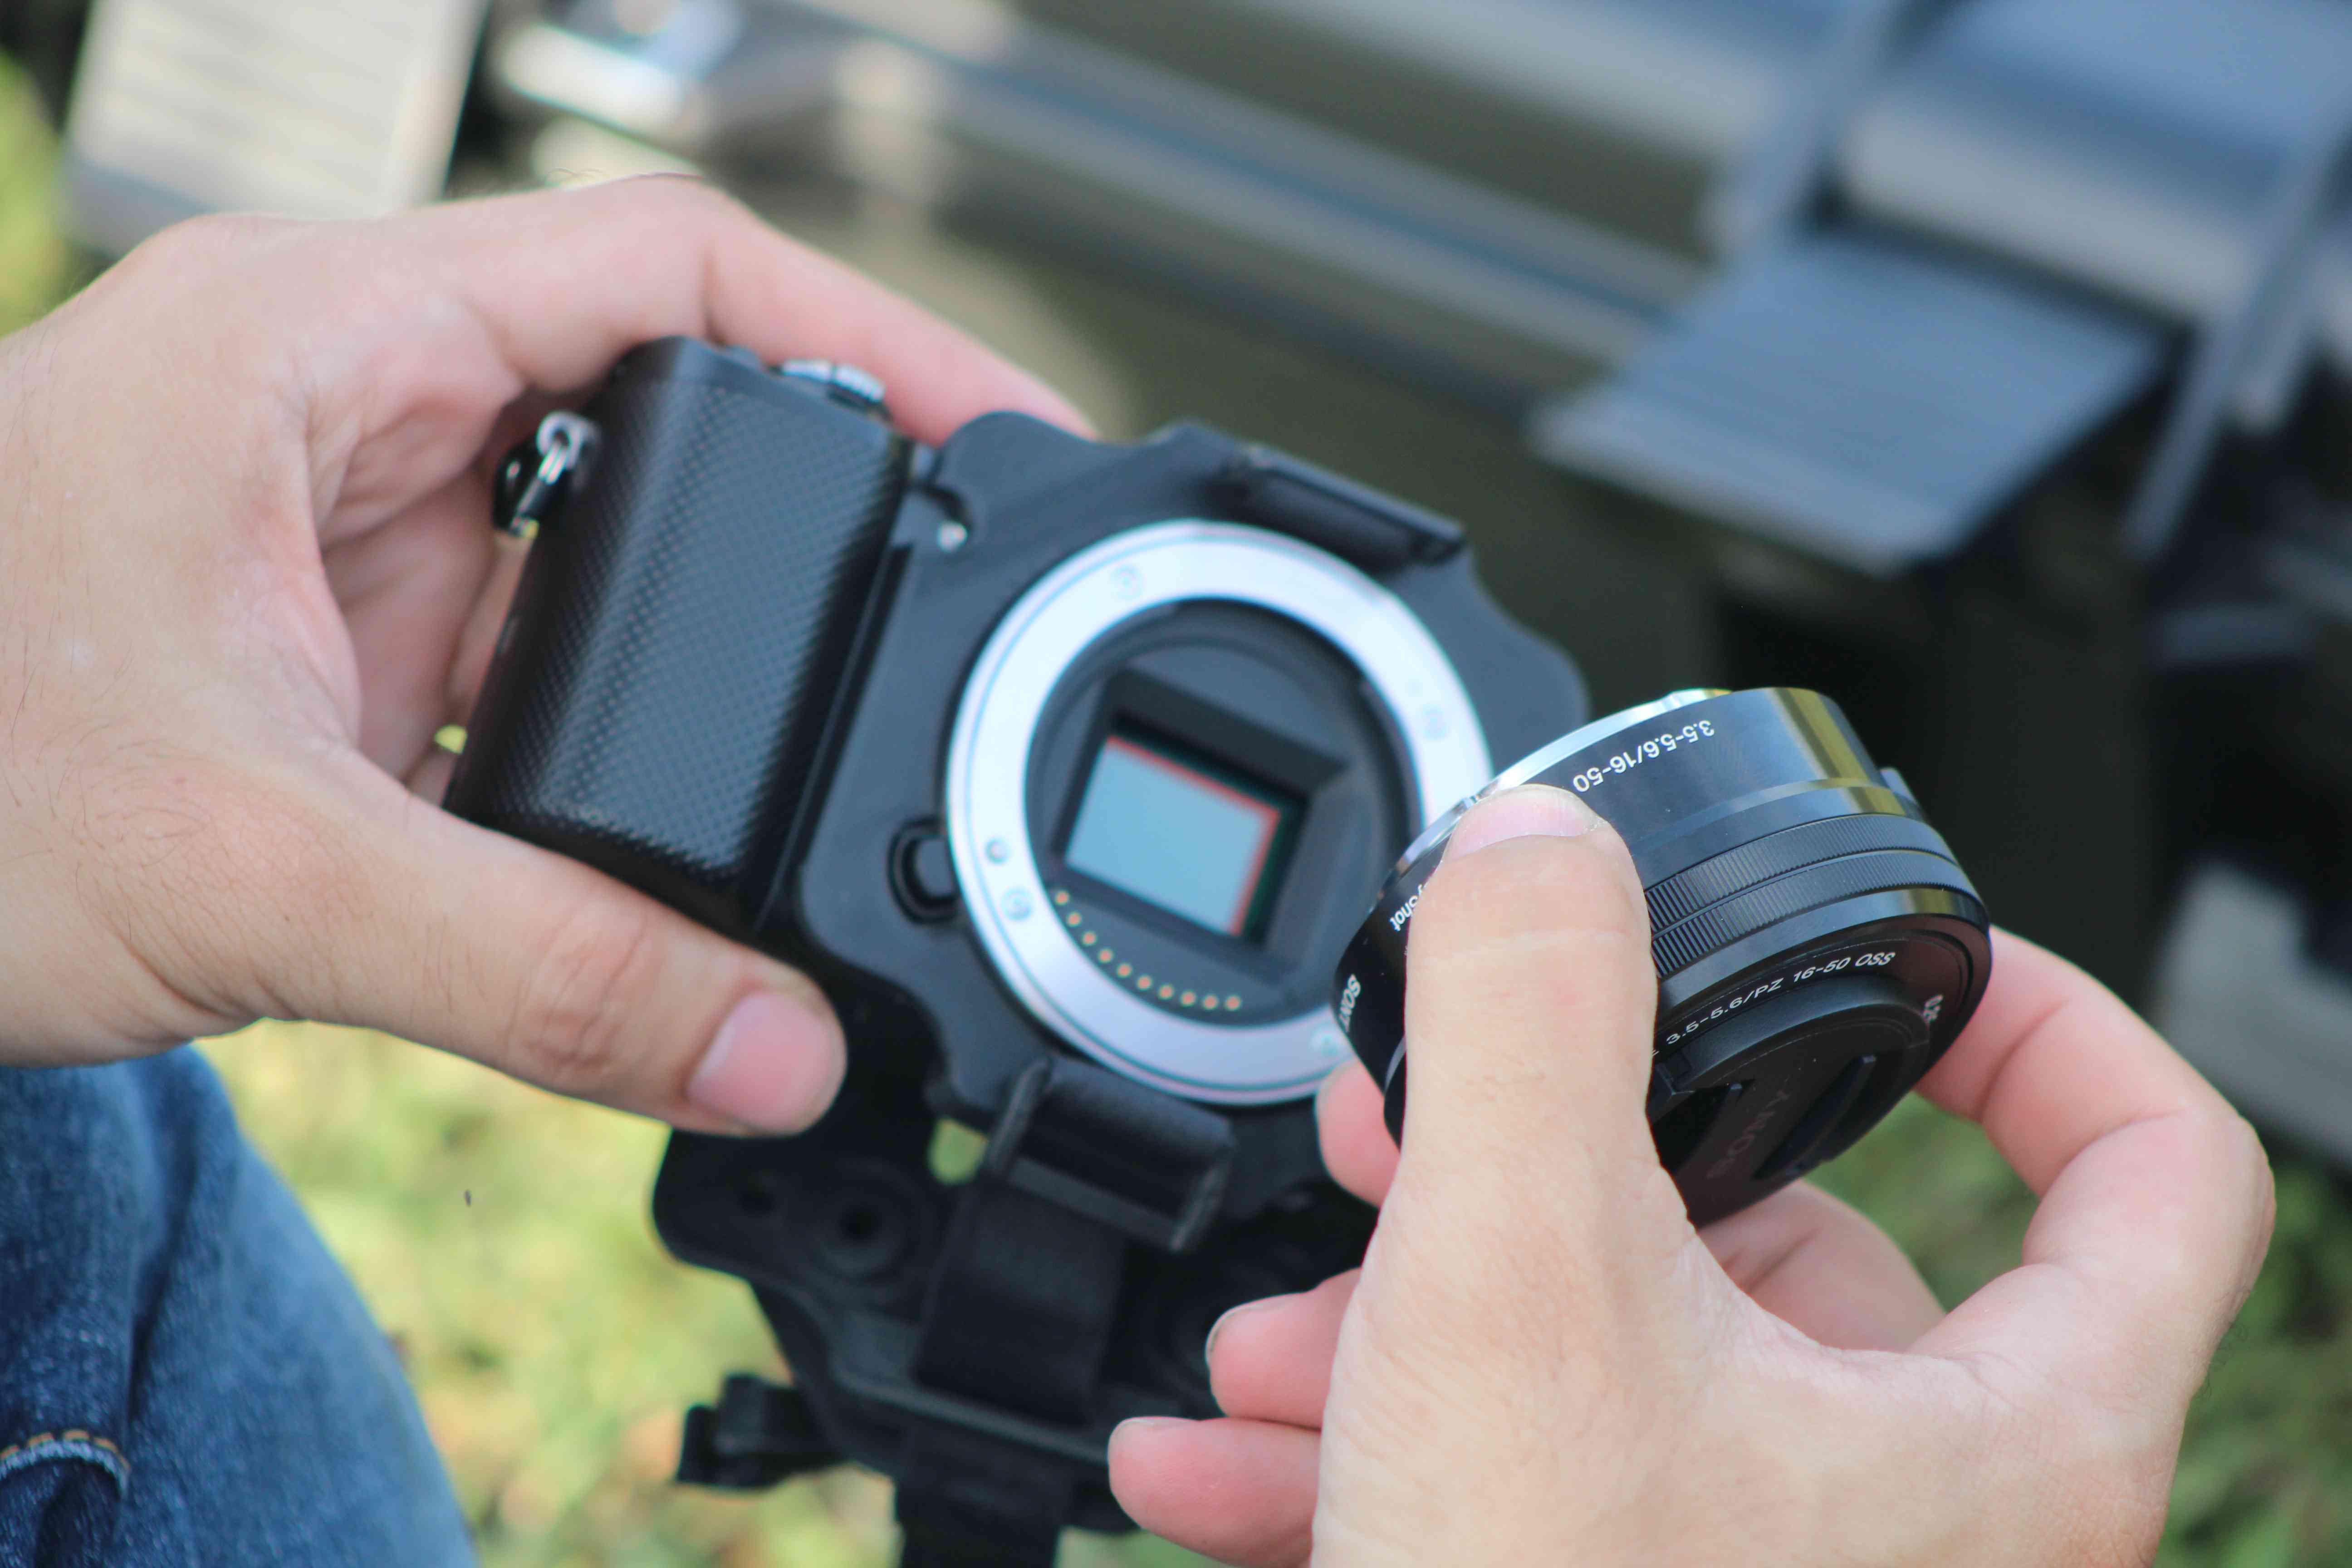 The image sensor behind the lens of a DSLR camera